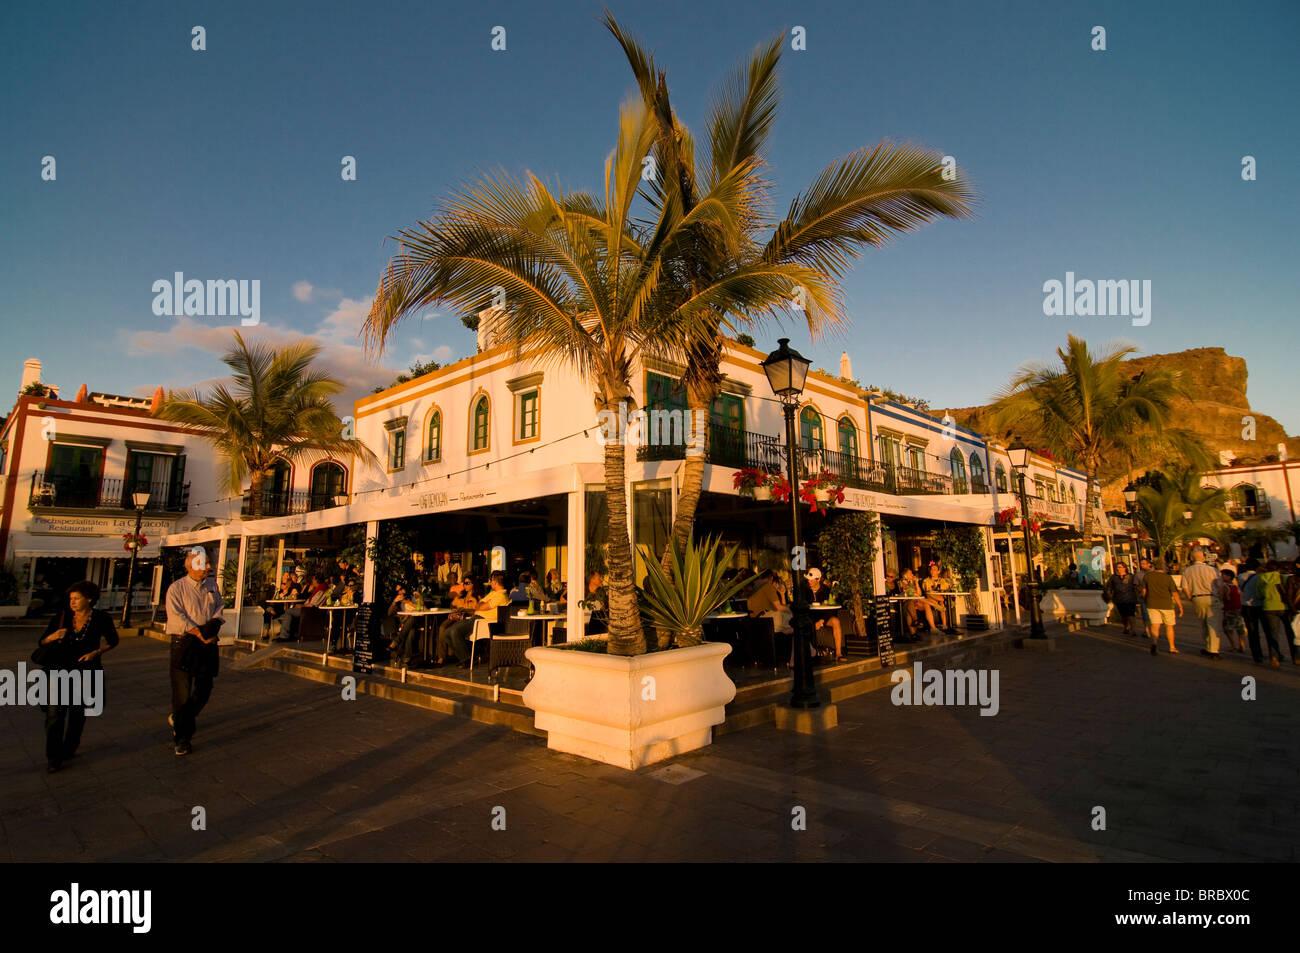 Restaurant in Puerto de Mogan, Gran Canaria, Kanarische Inseln, Spanien Stockbild